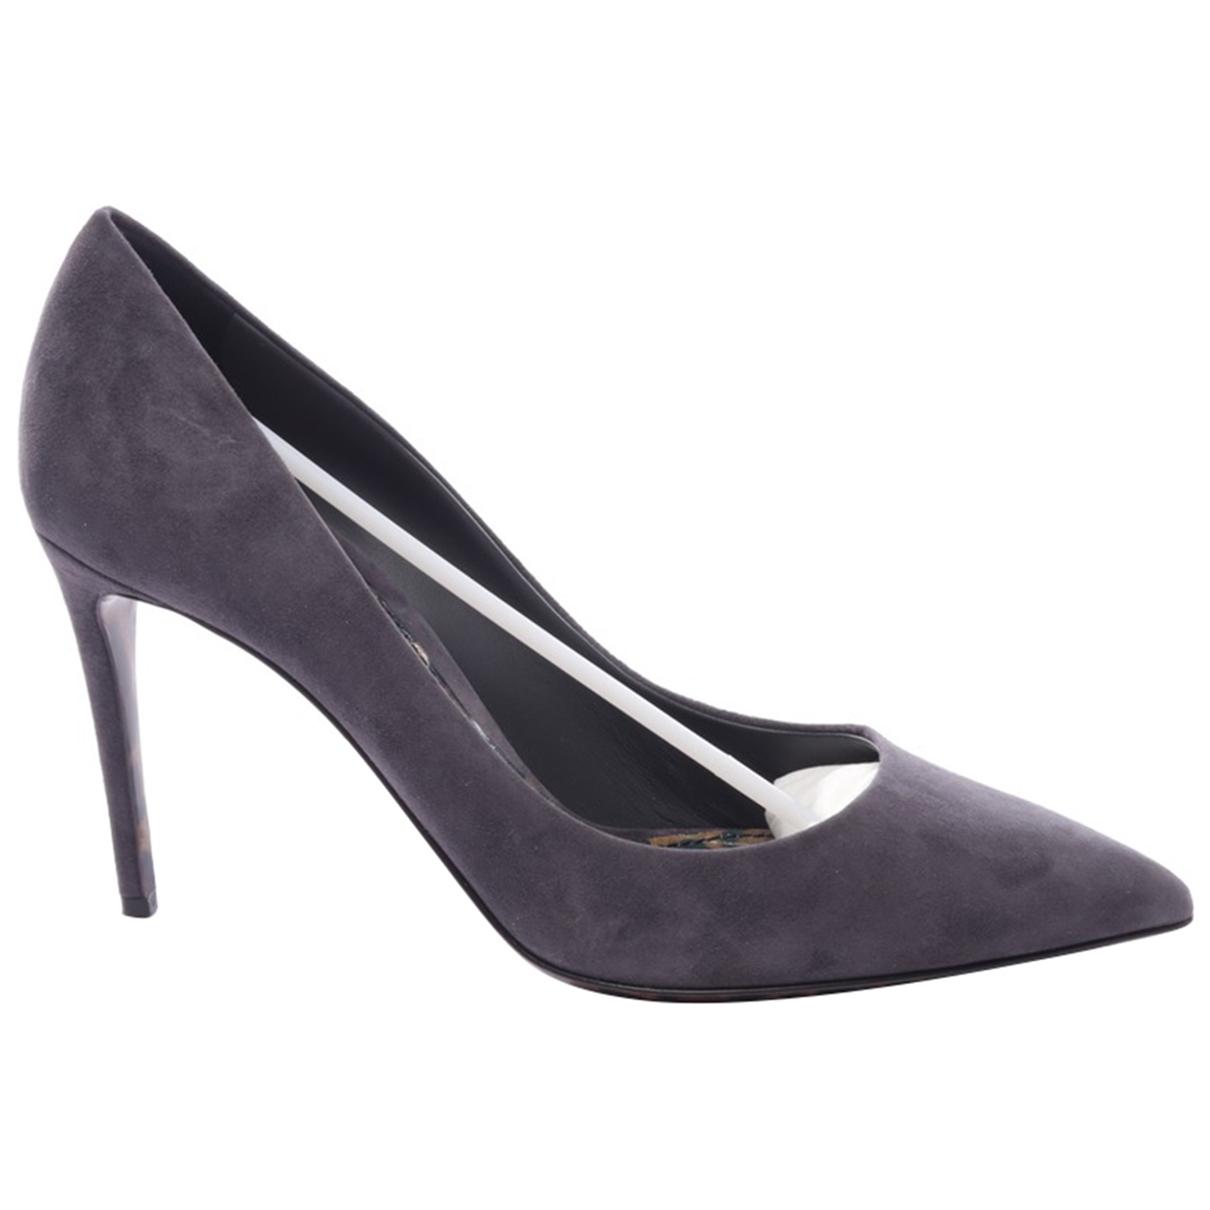 Dolce & Gabbana \N Grey Leather Heels for Women 41 EU